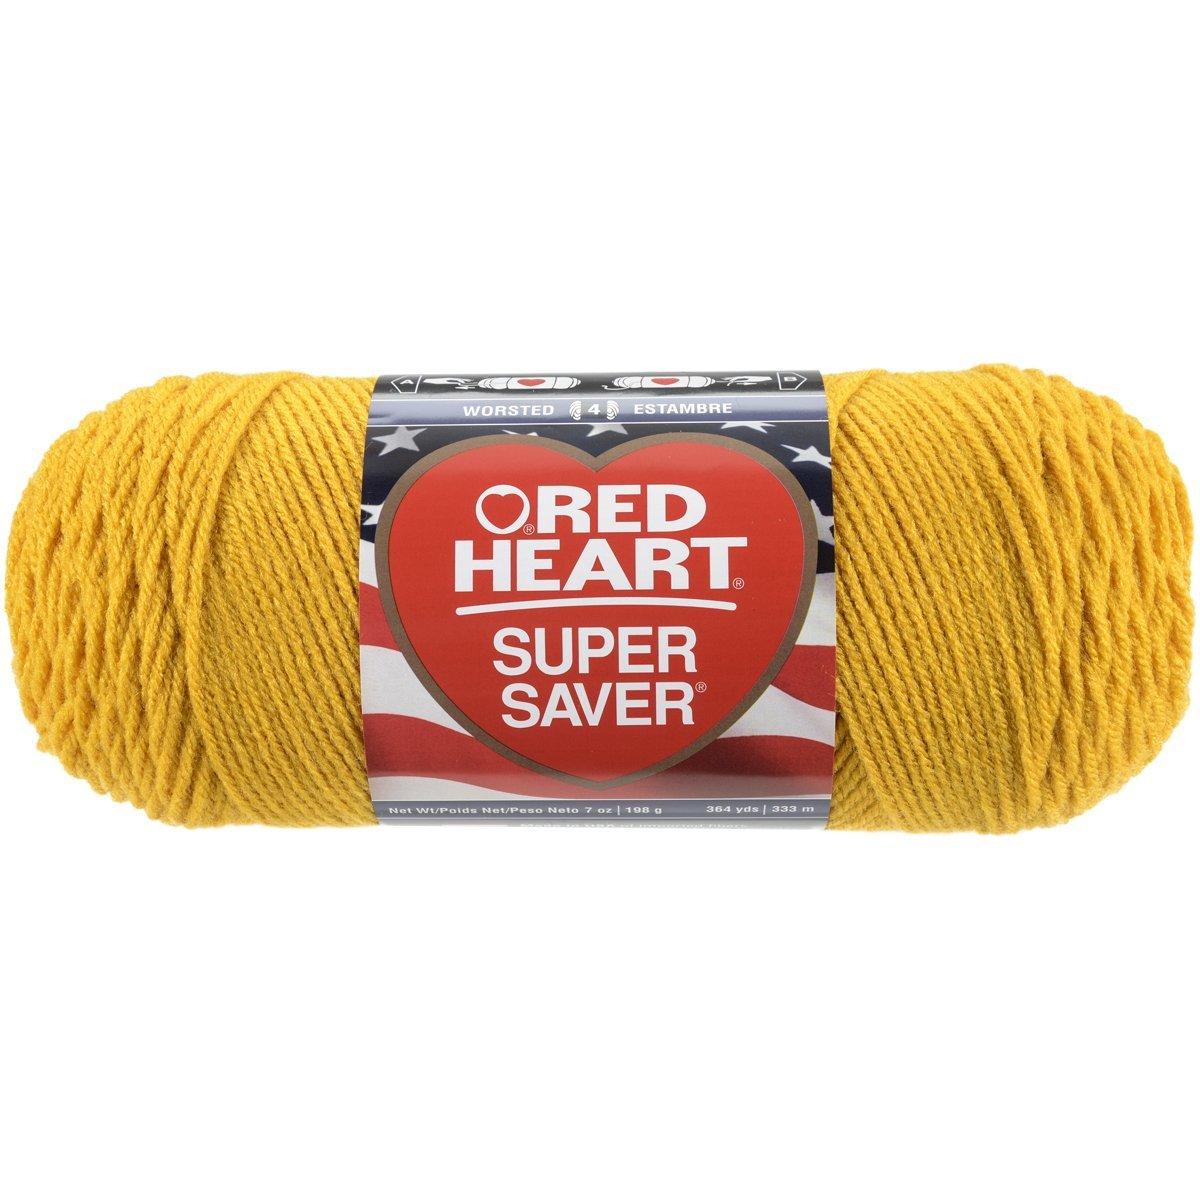 Red Heart Super Saver Economy Yarn, Cherry Red [Cherry Red] $2.06 @amazon